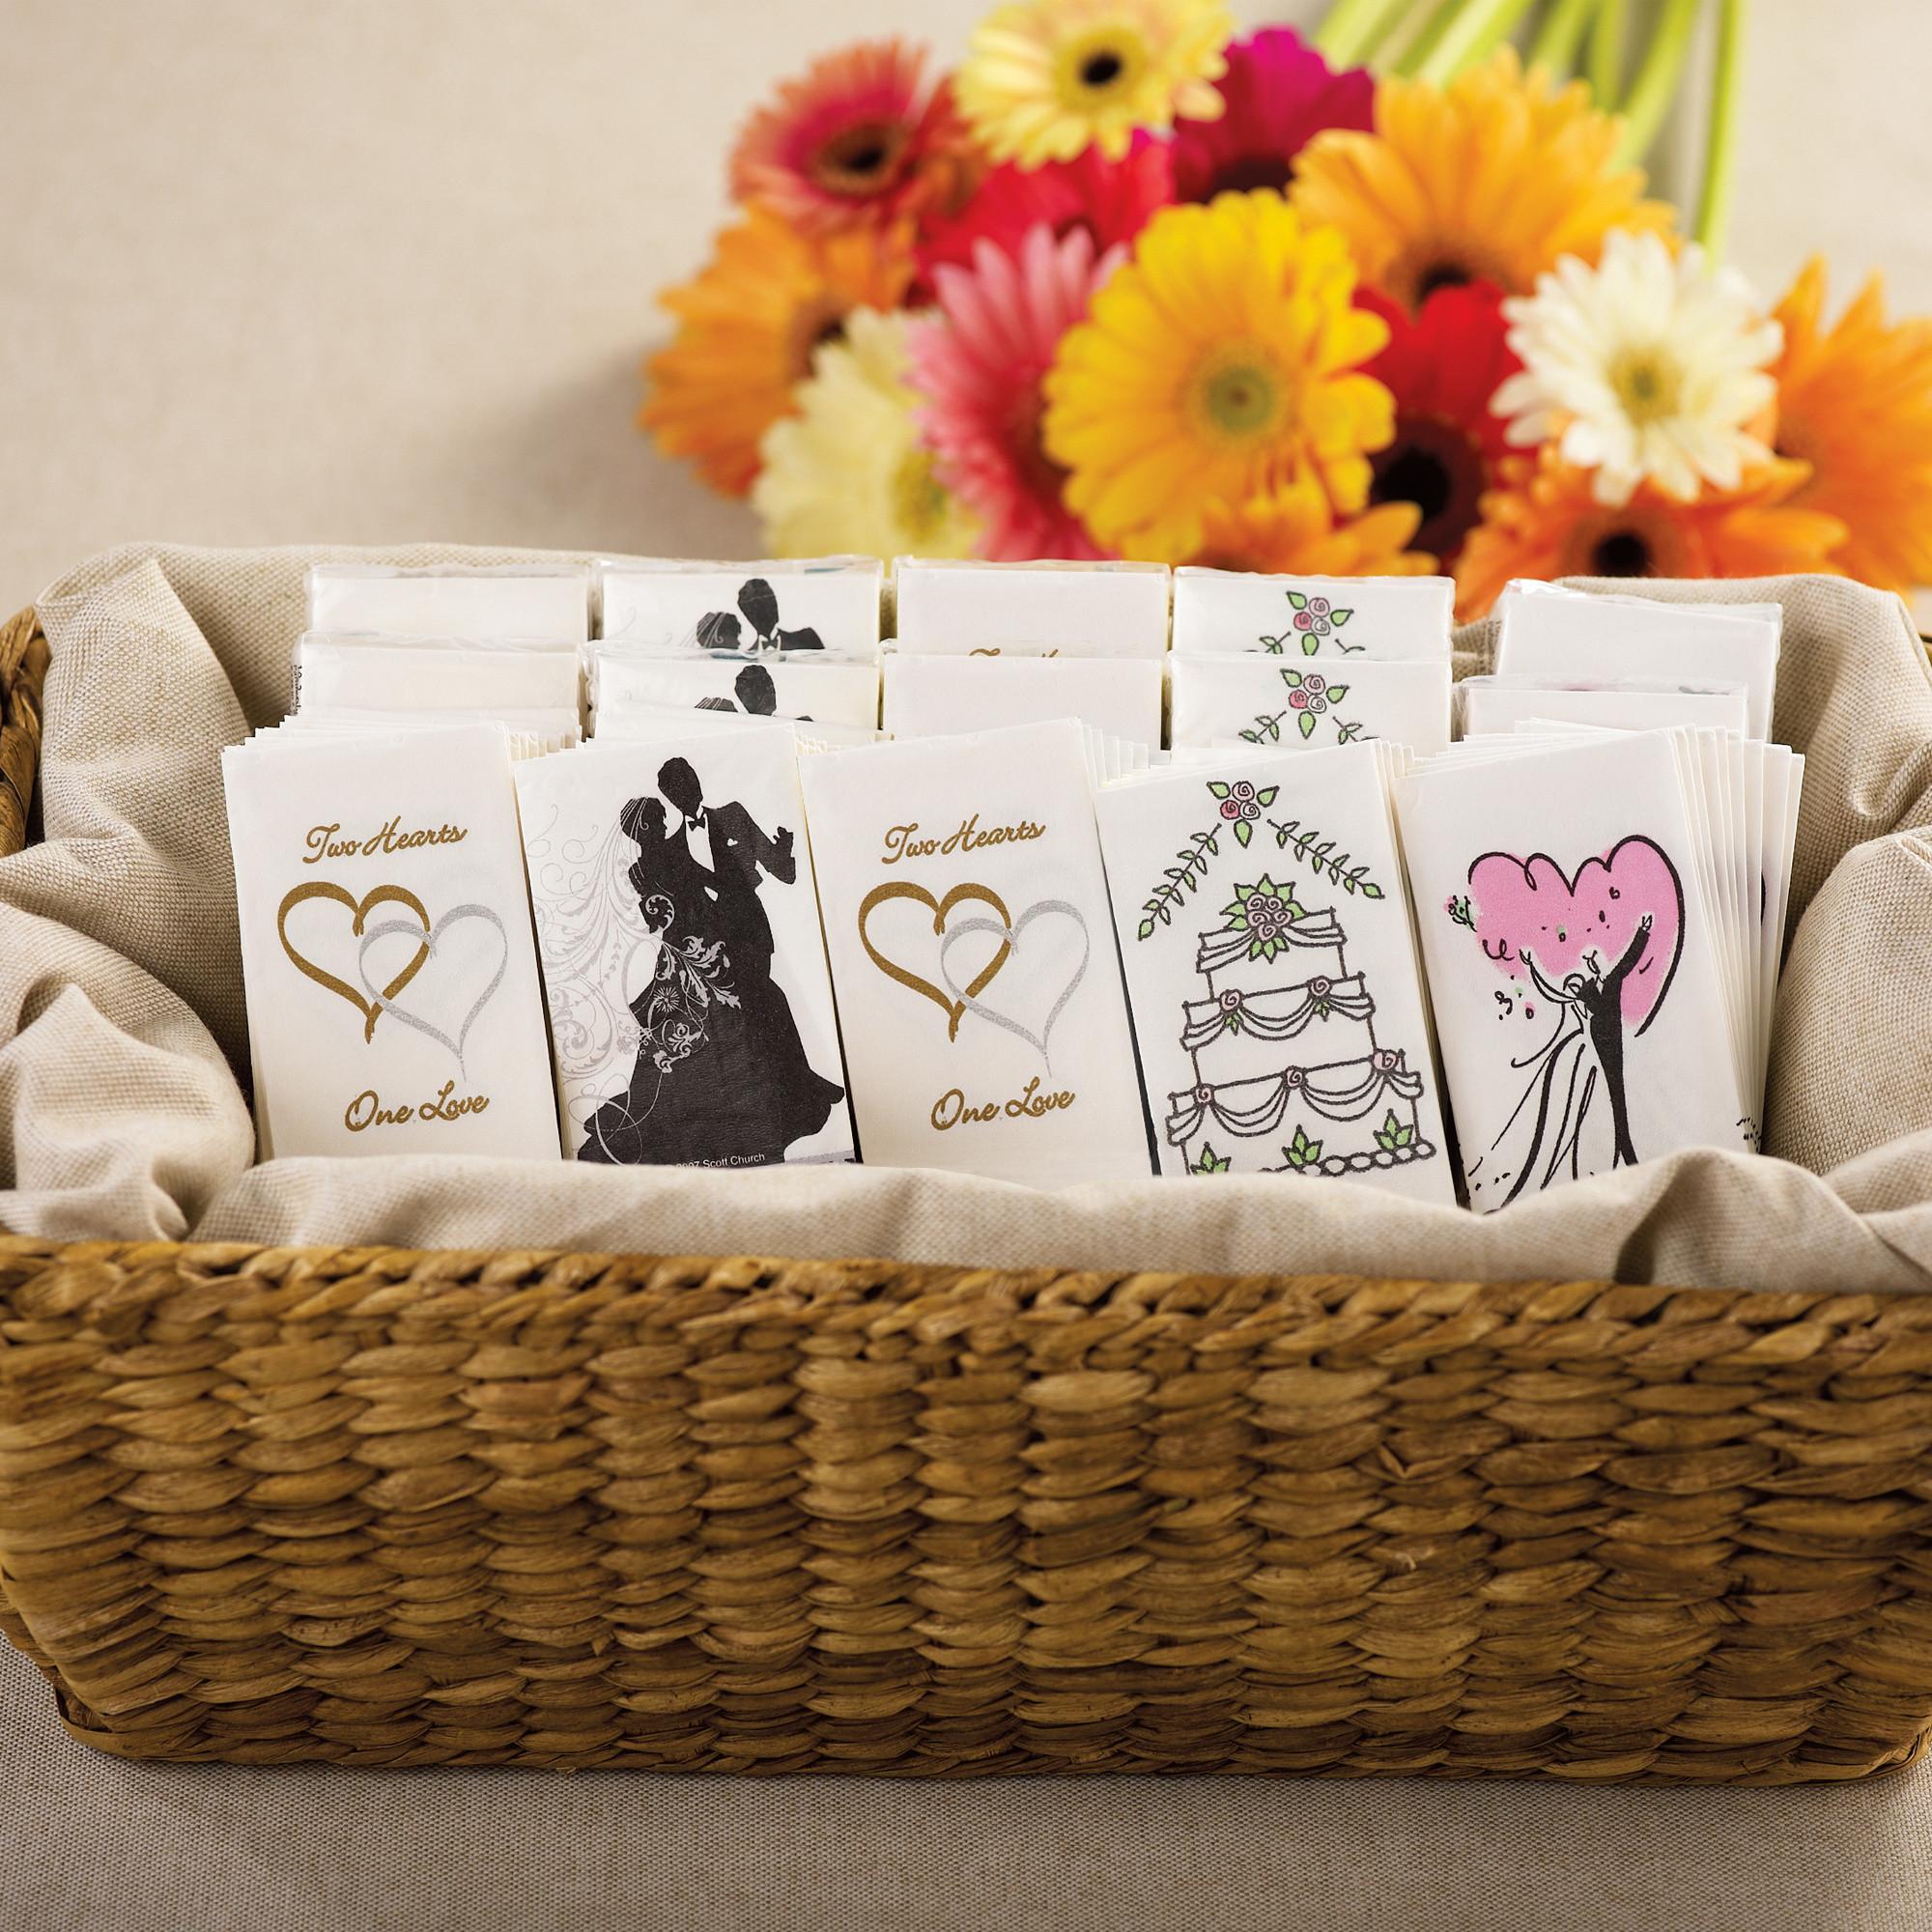 Wedding Ceremony Accessories viewall true wedding supplies Tears of Joy Wedding Tissues